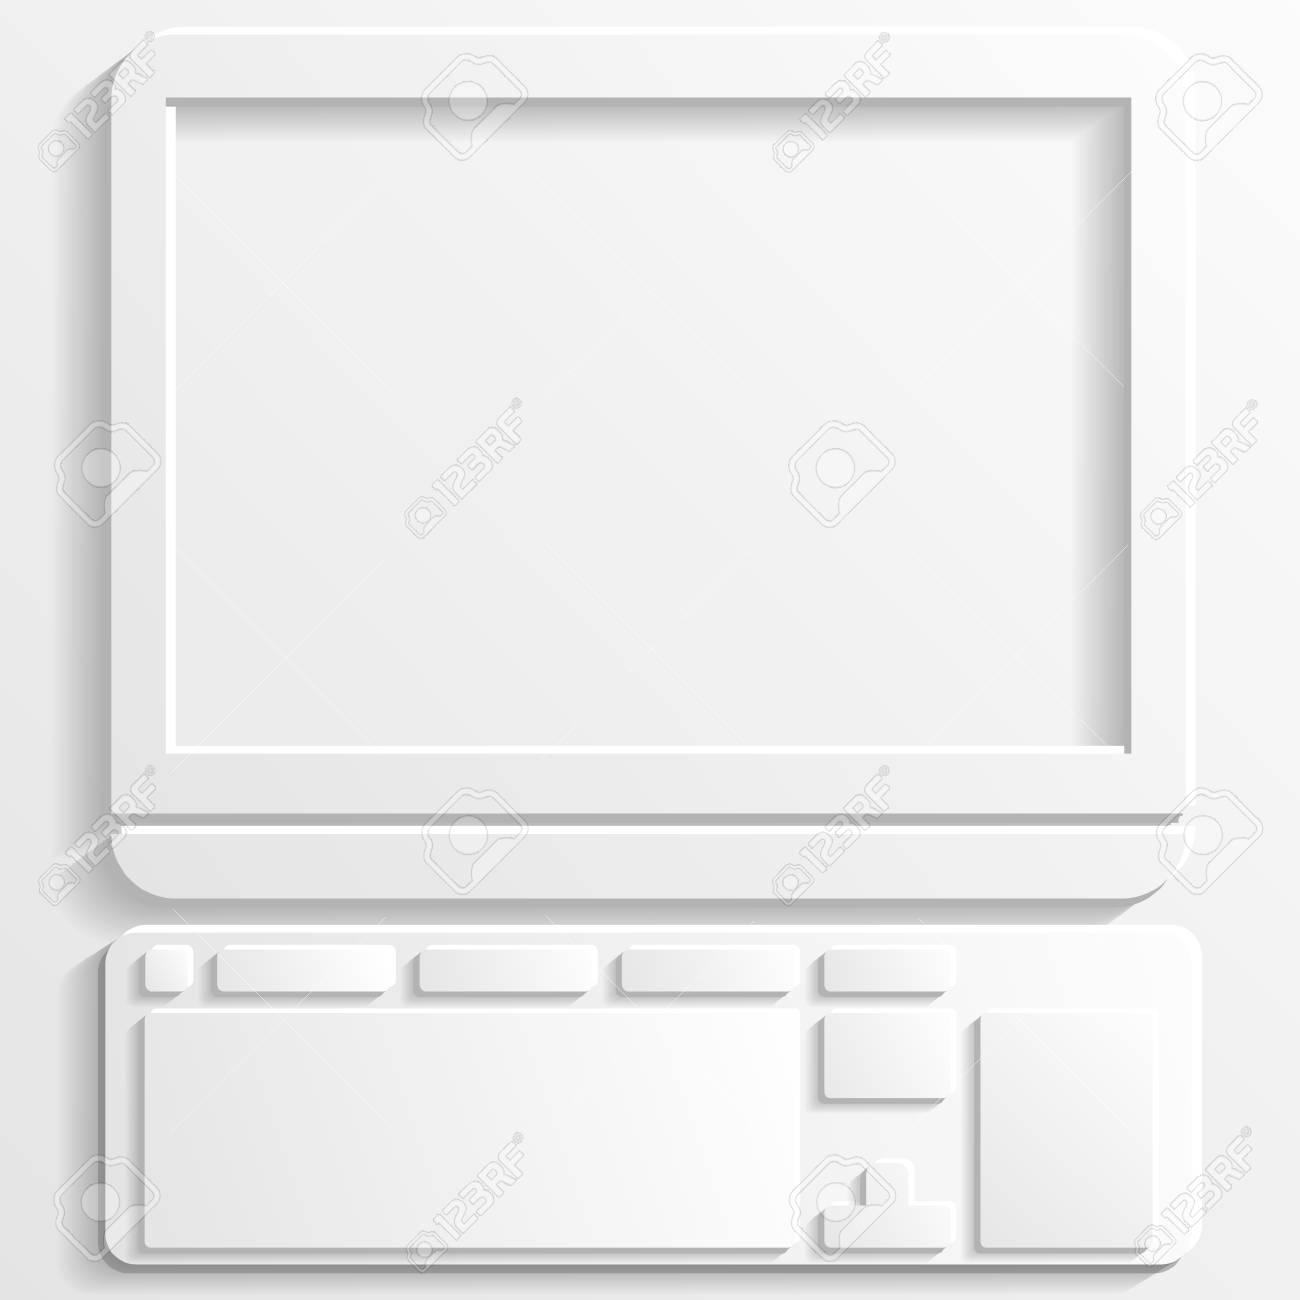 computer icon Stock Vector - 22243526